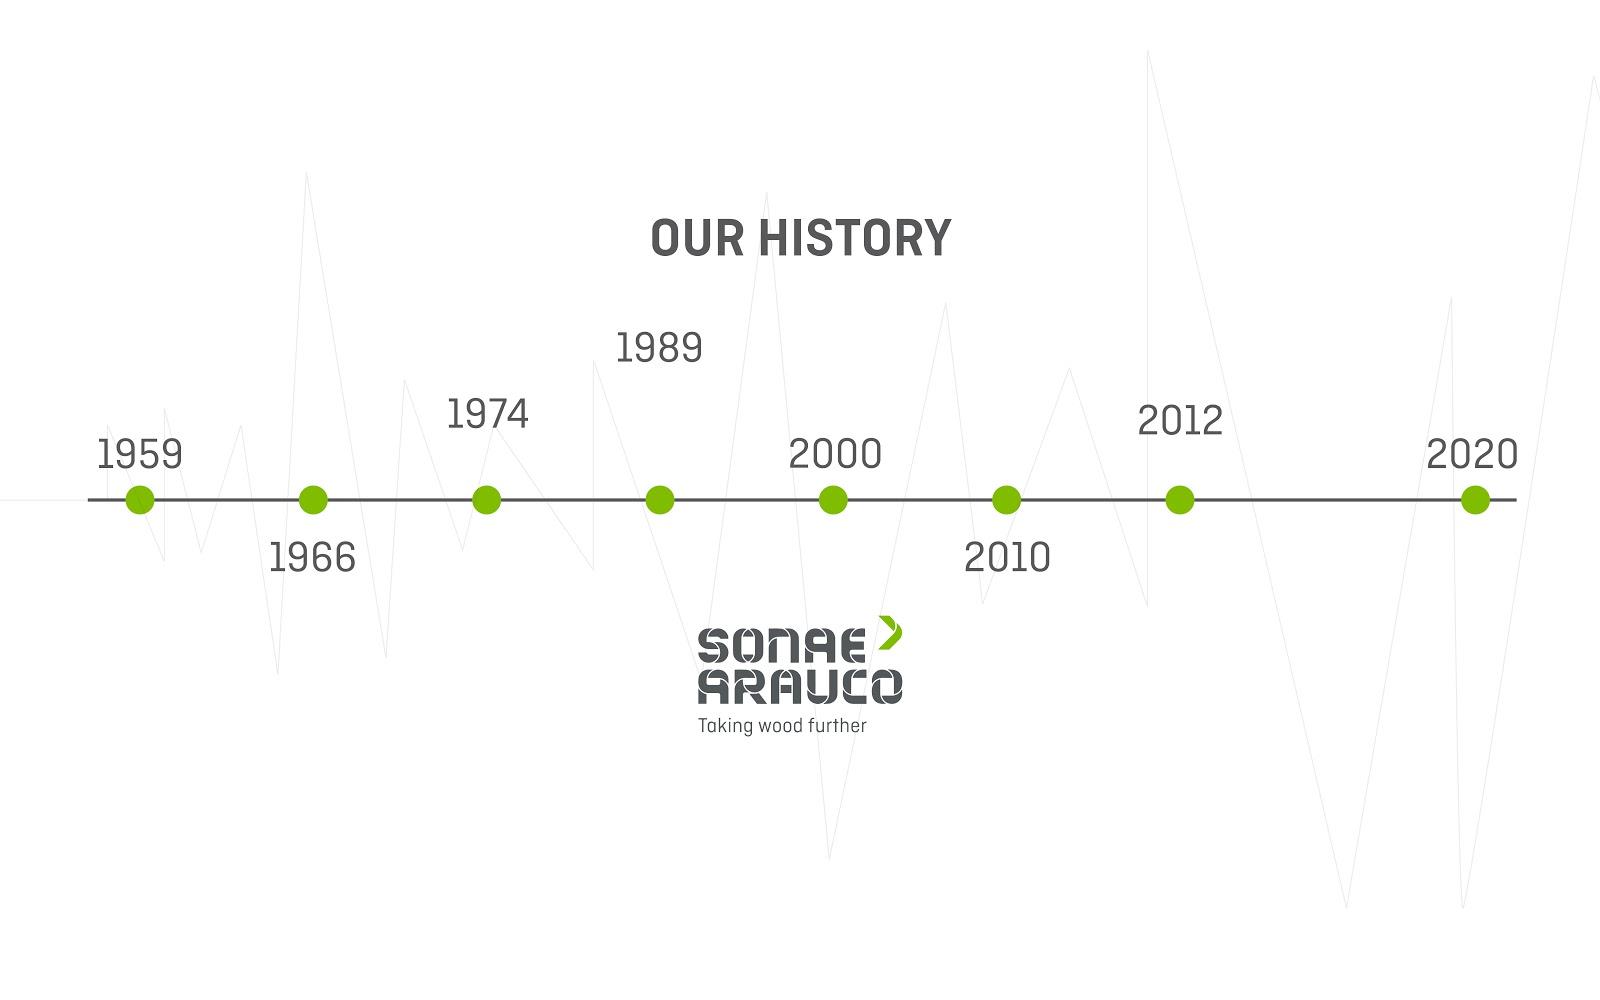 The history of Sonae Arauco